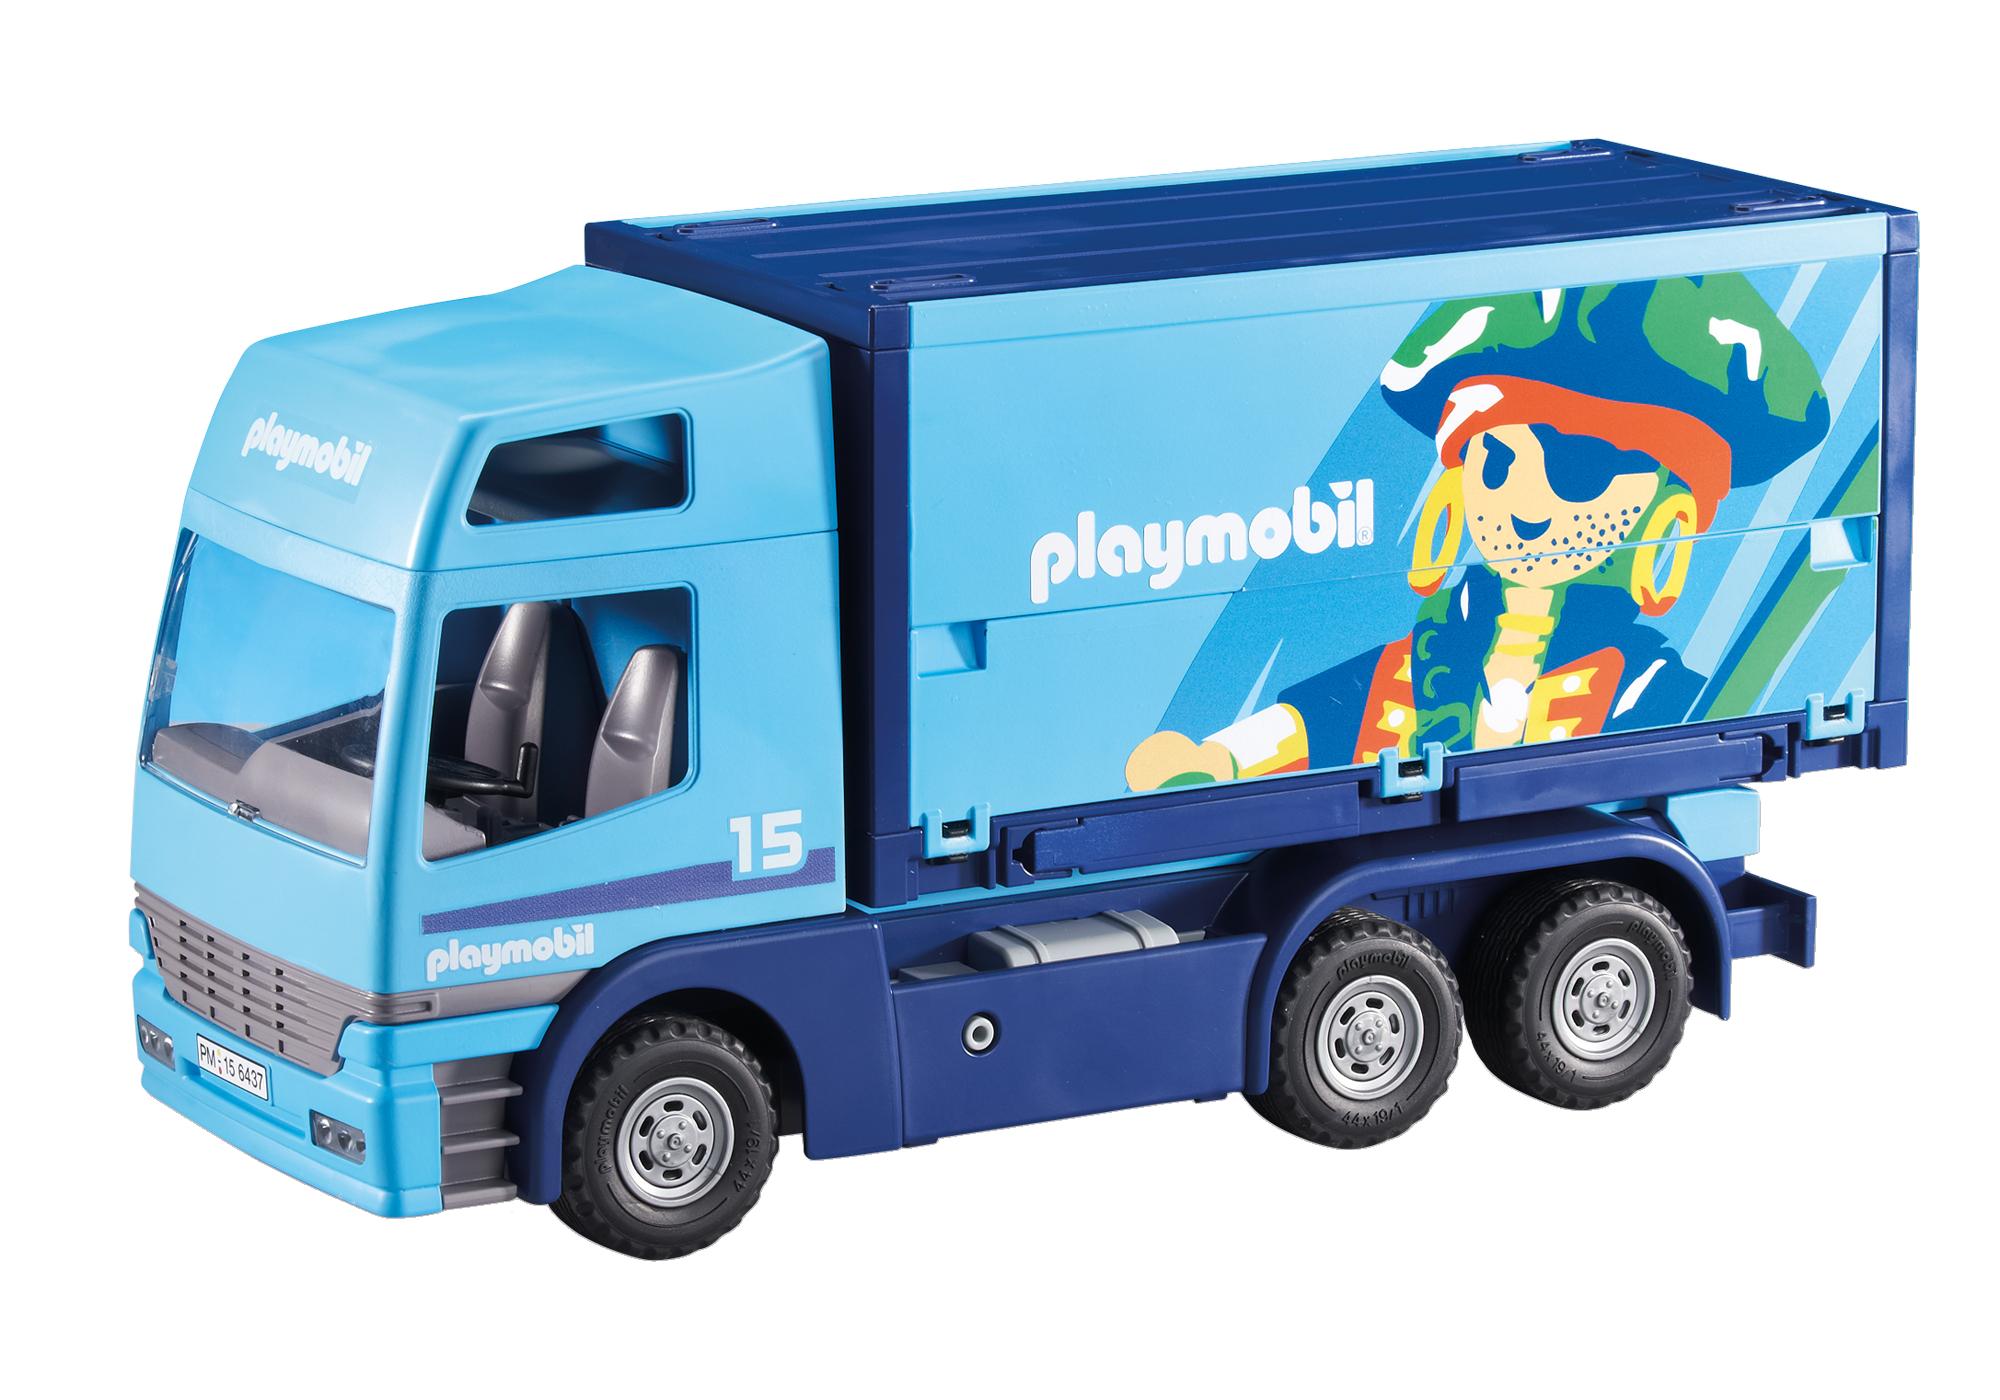 http://media.playmobil.com/i/playmobil/6437_product_detail